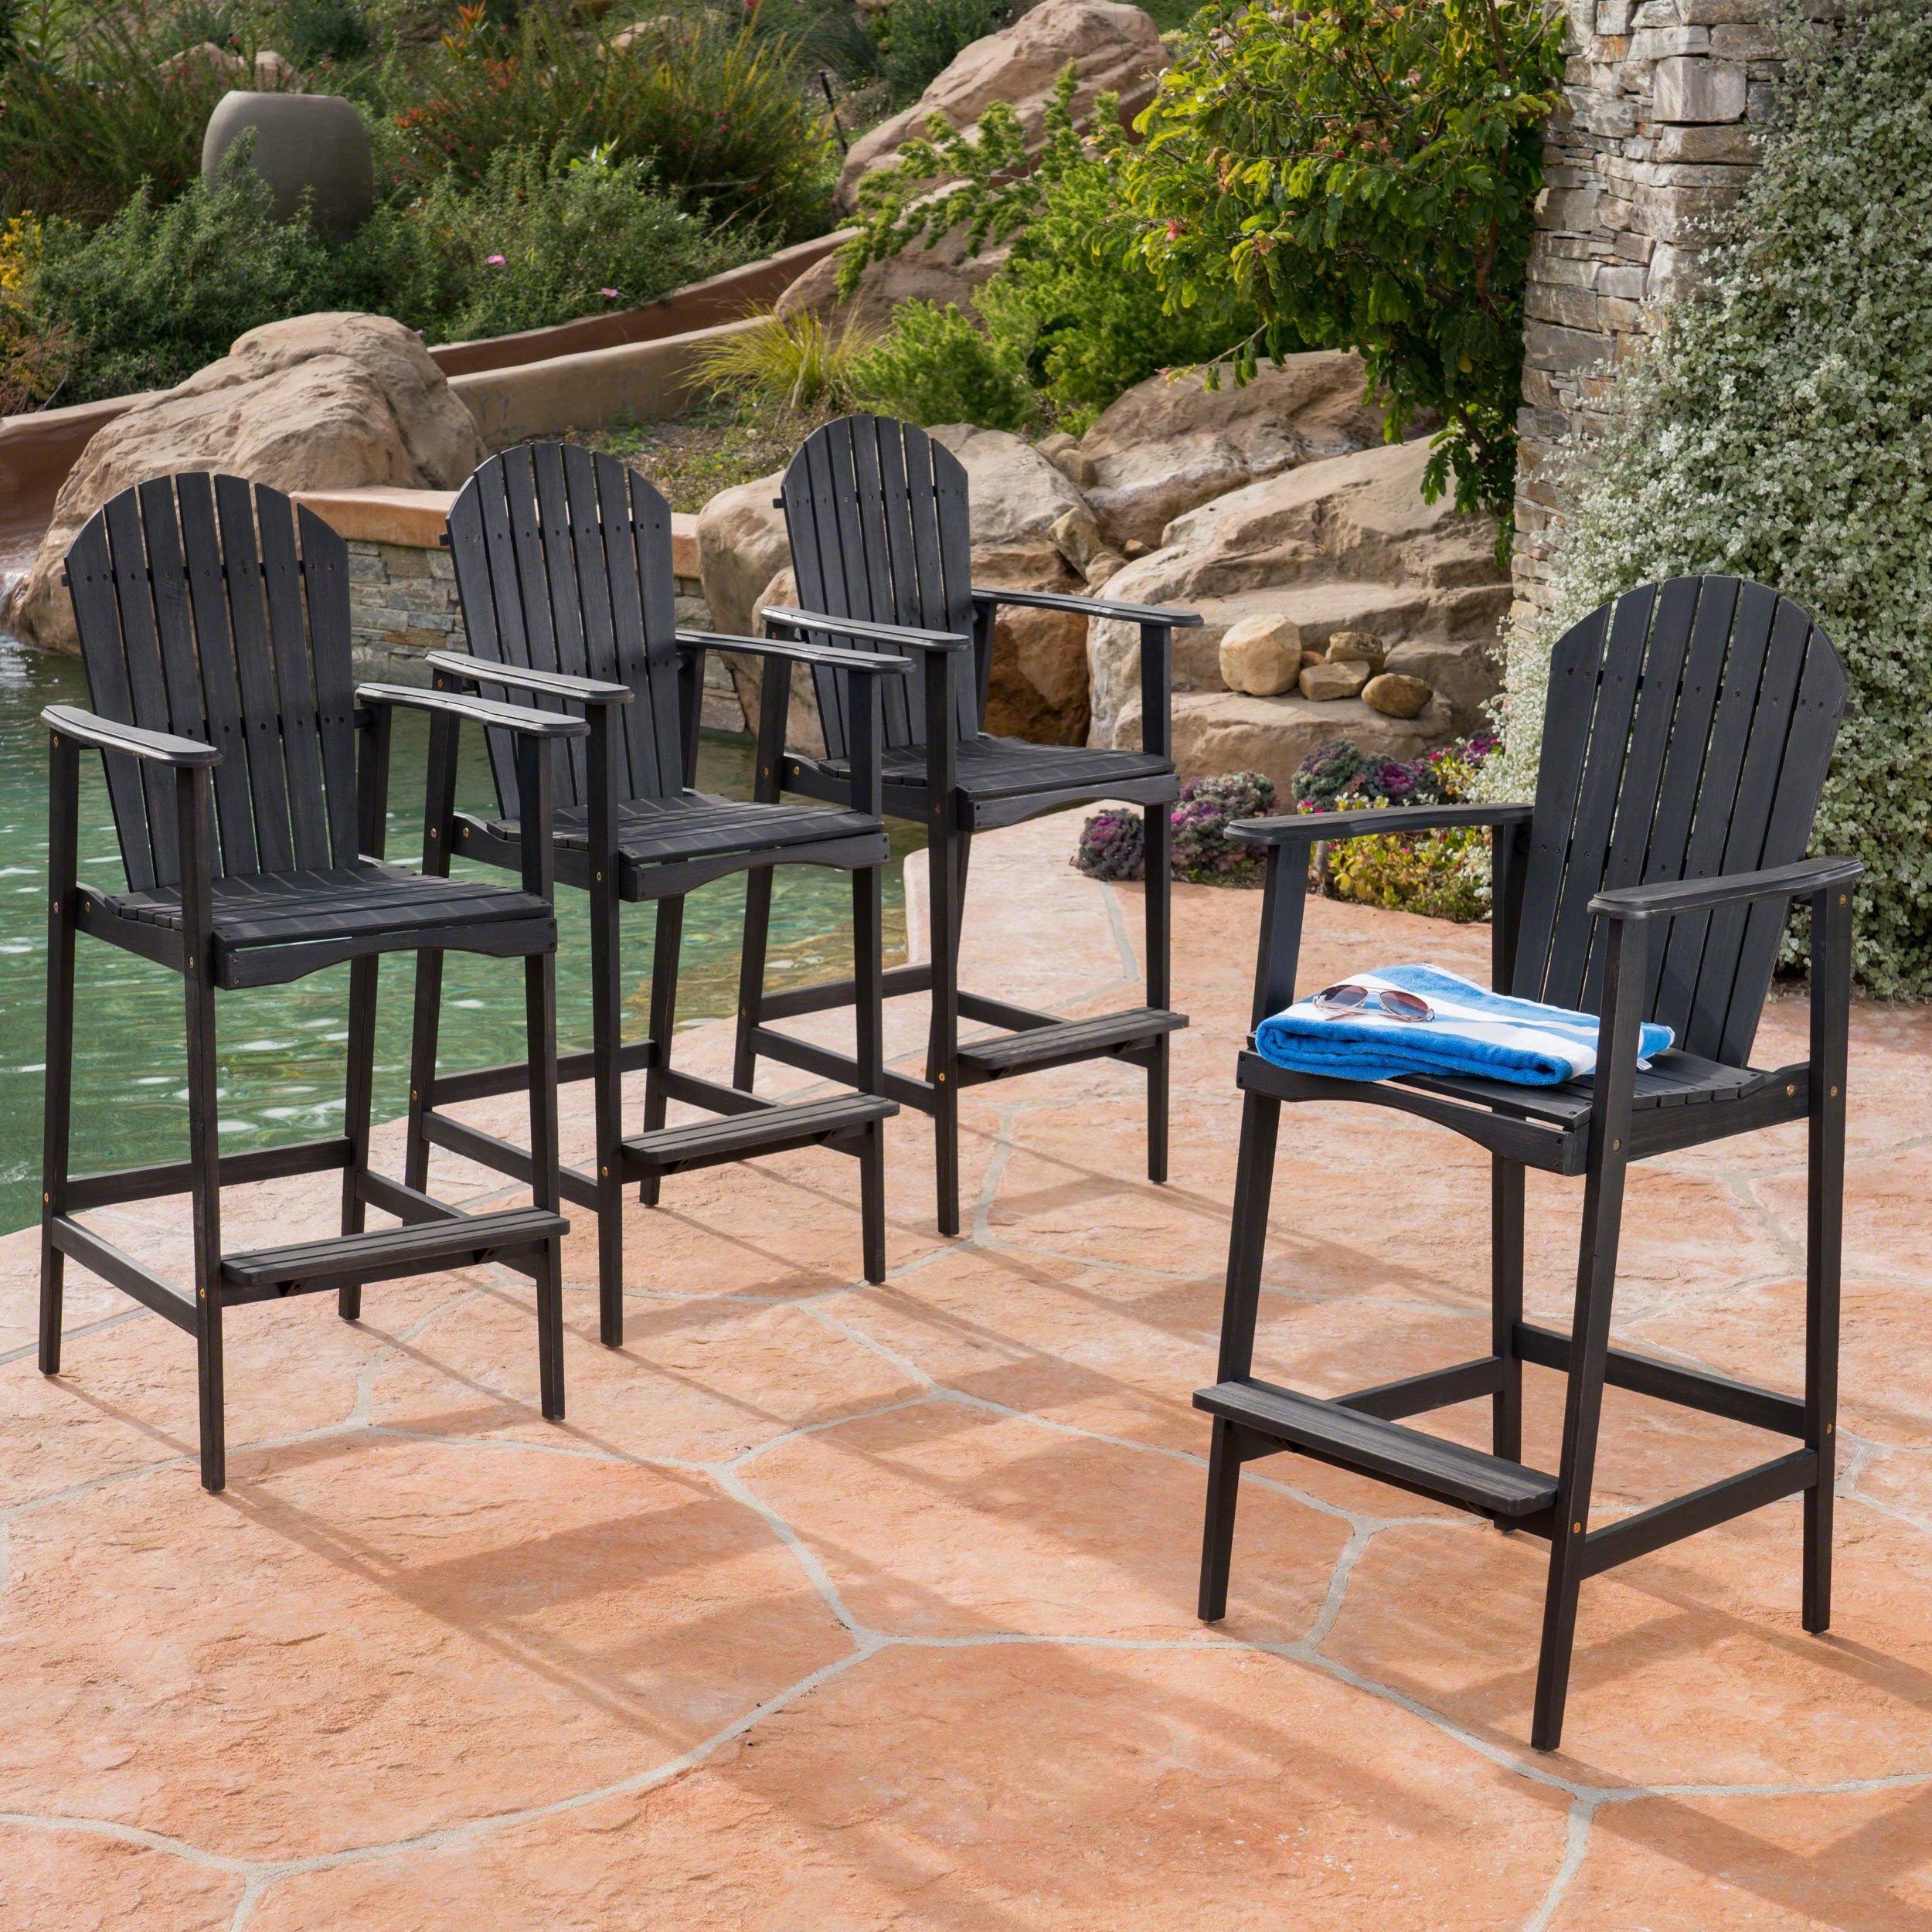 Great Deal Furniture Malibu Outdoor Dark Grey Finished Acacia Wood Adirondack Barstools (Set of 4)